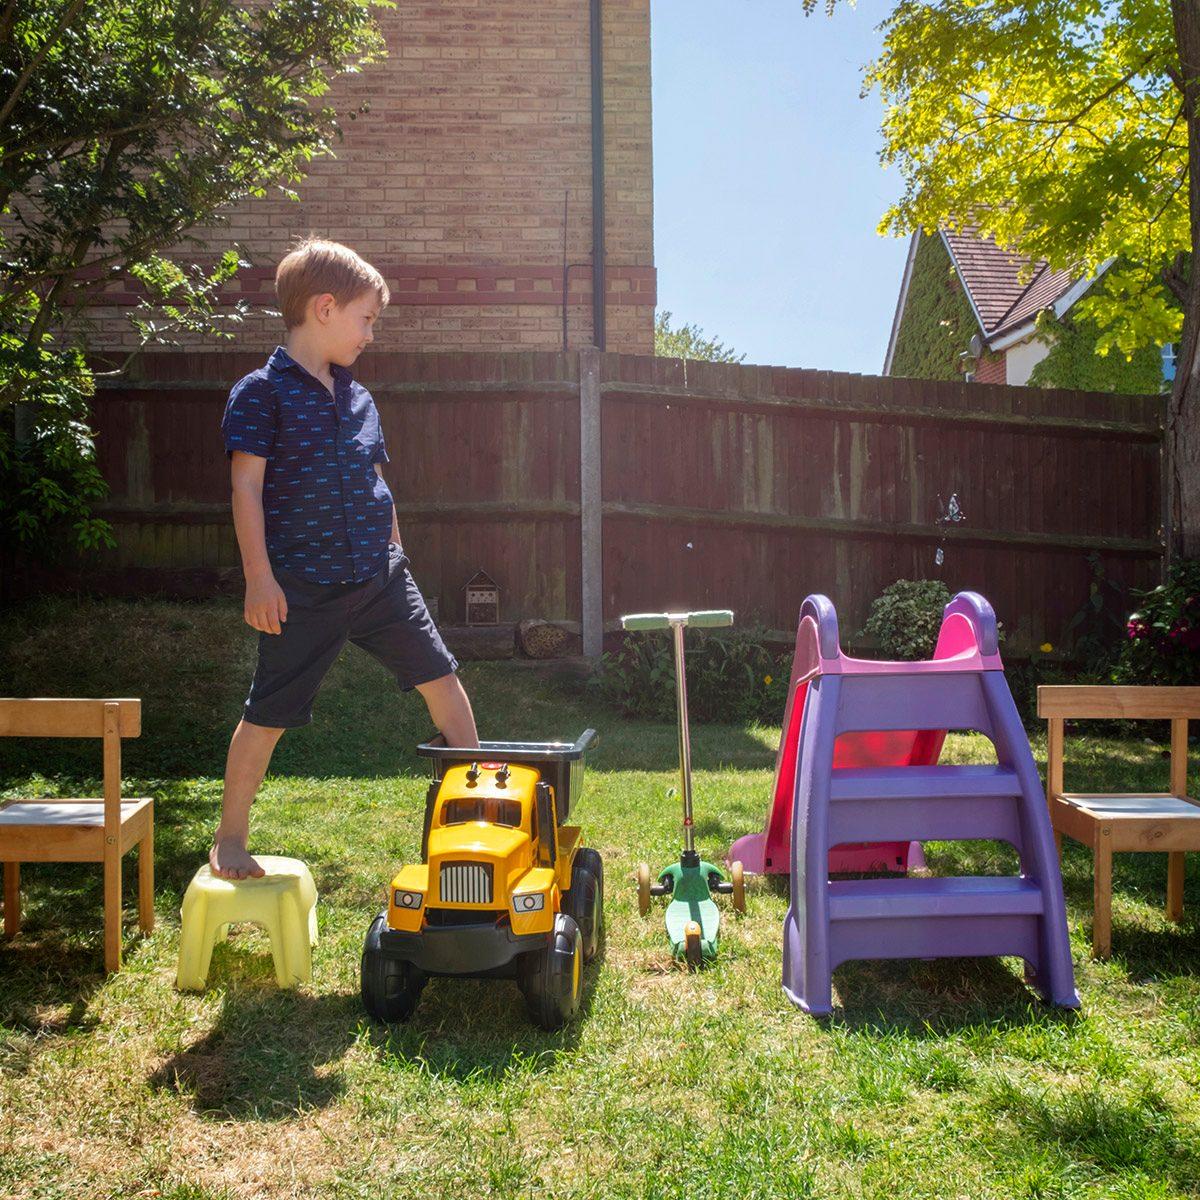 Boy walking on toys arranged in yard